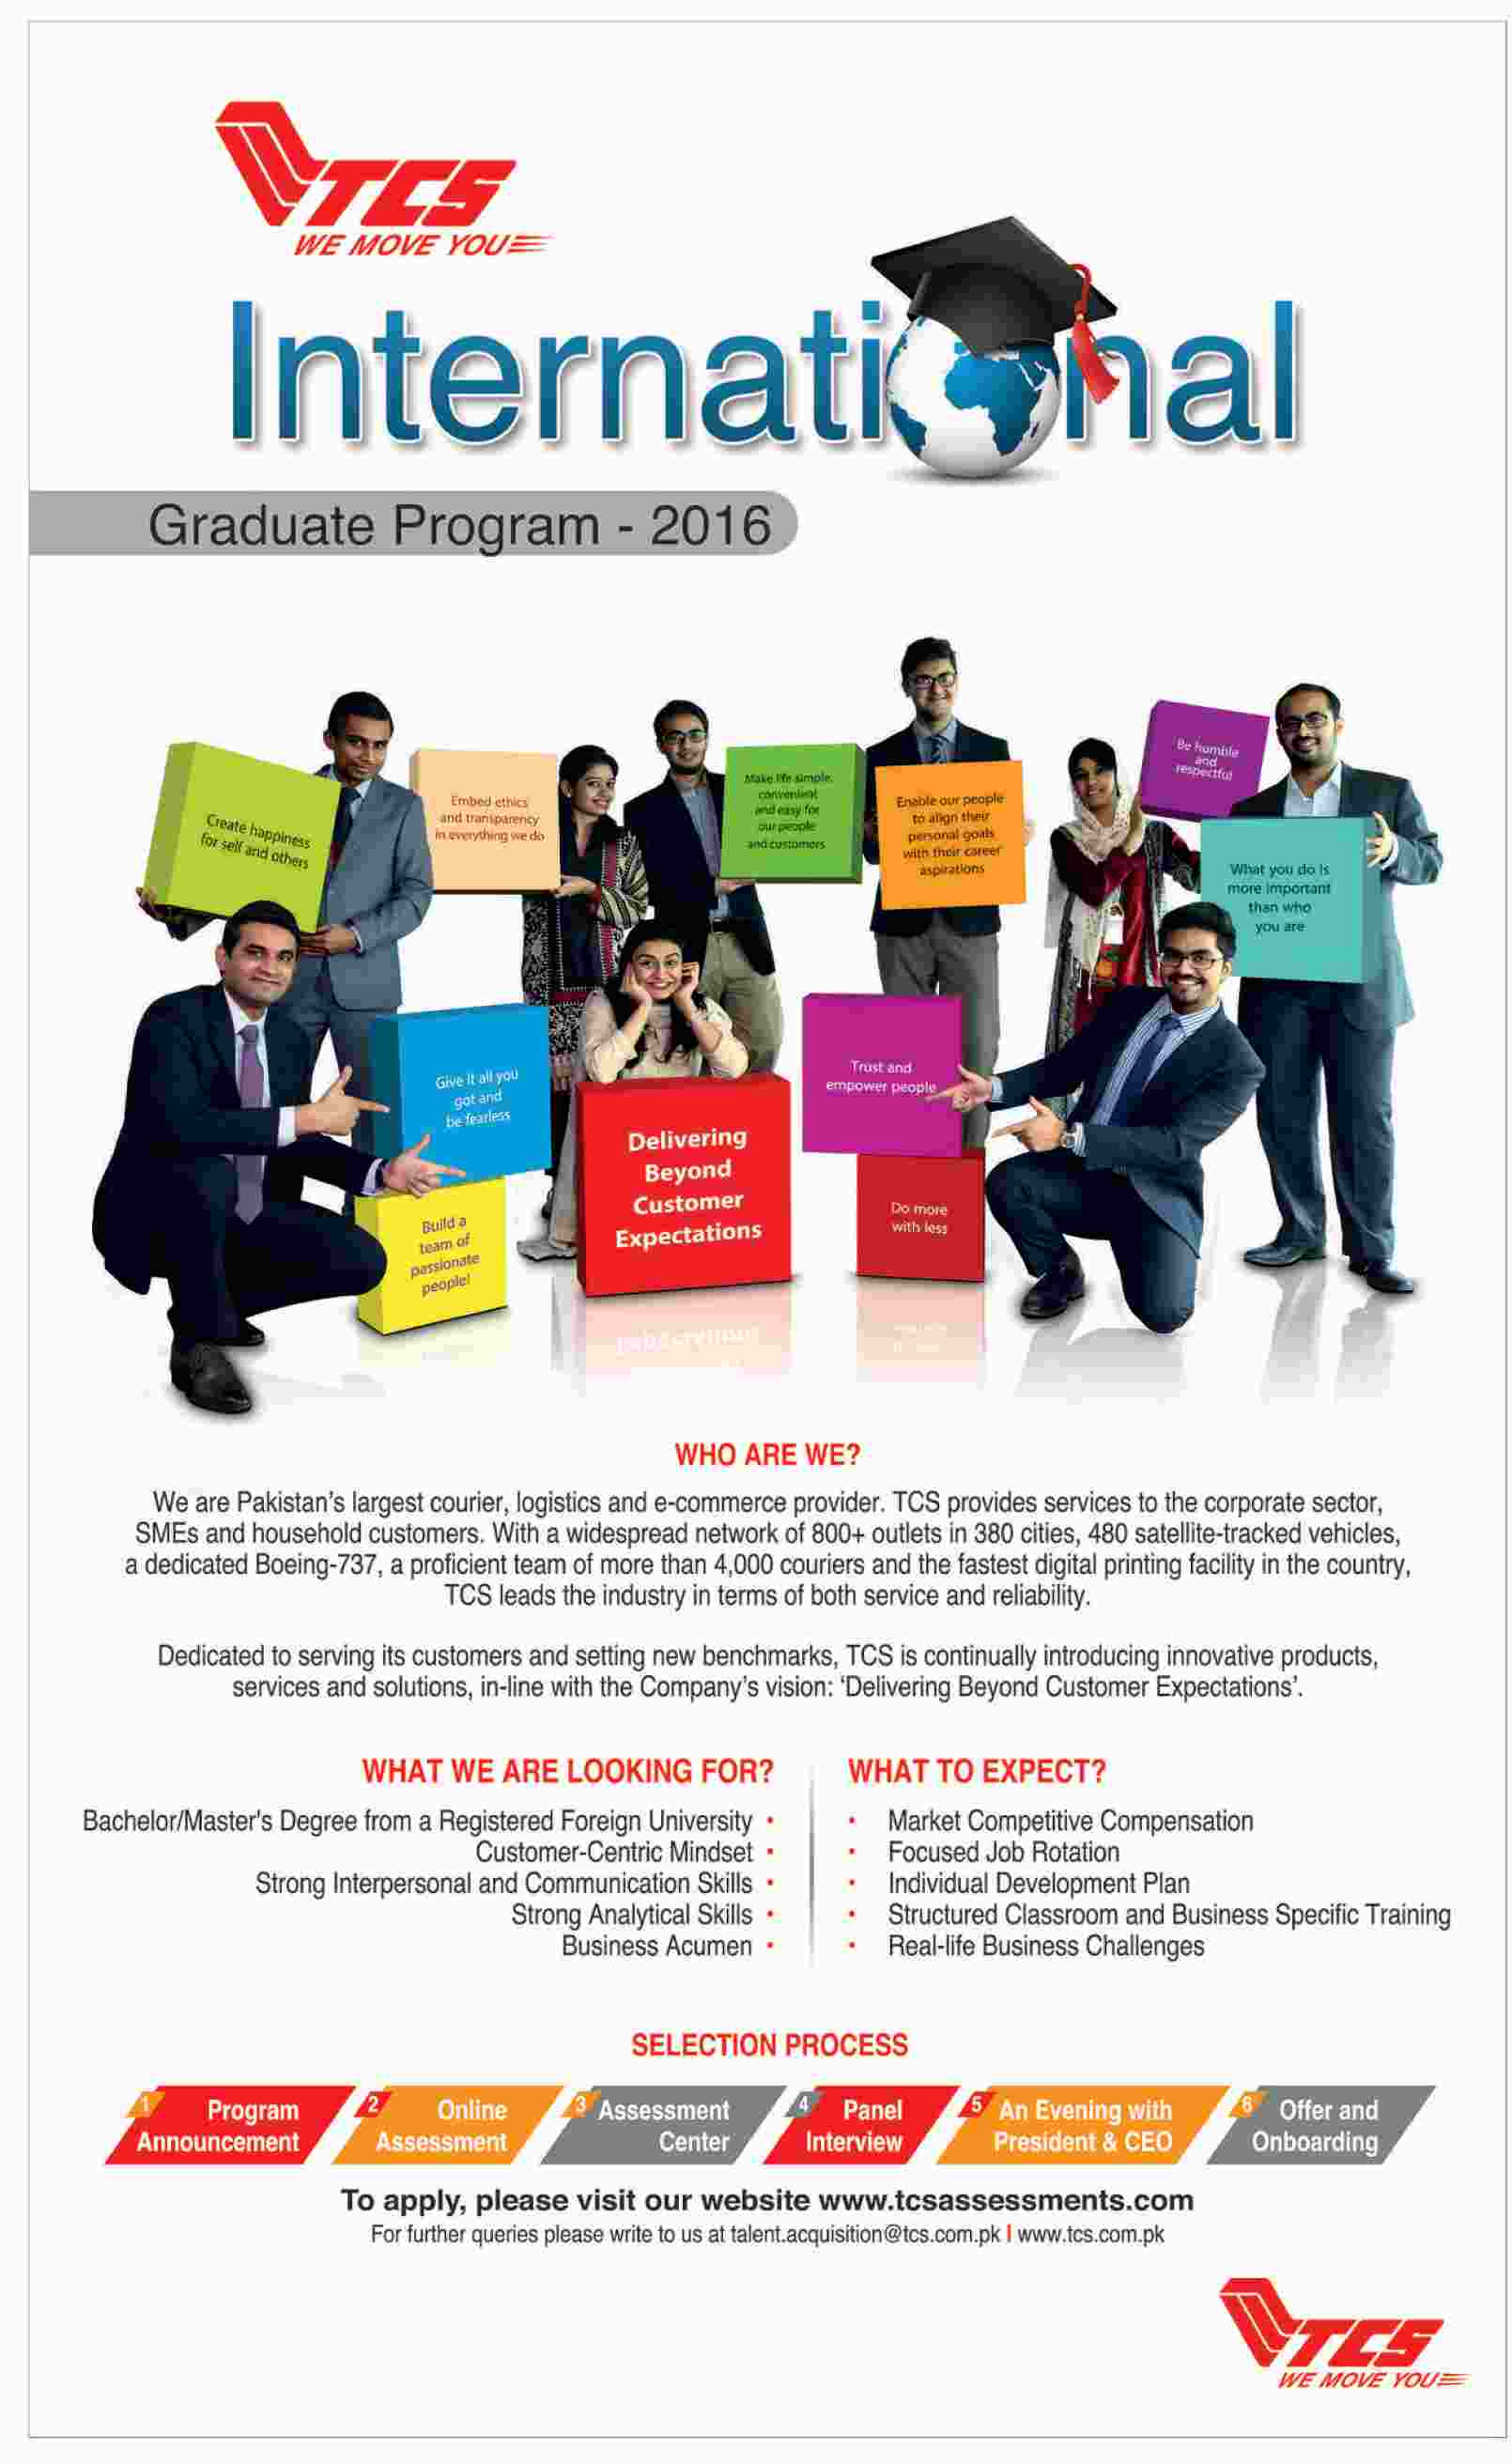 TCS Graduate Program 2016